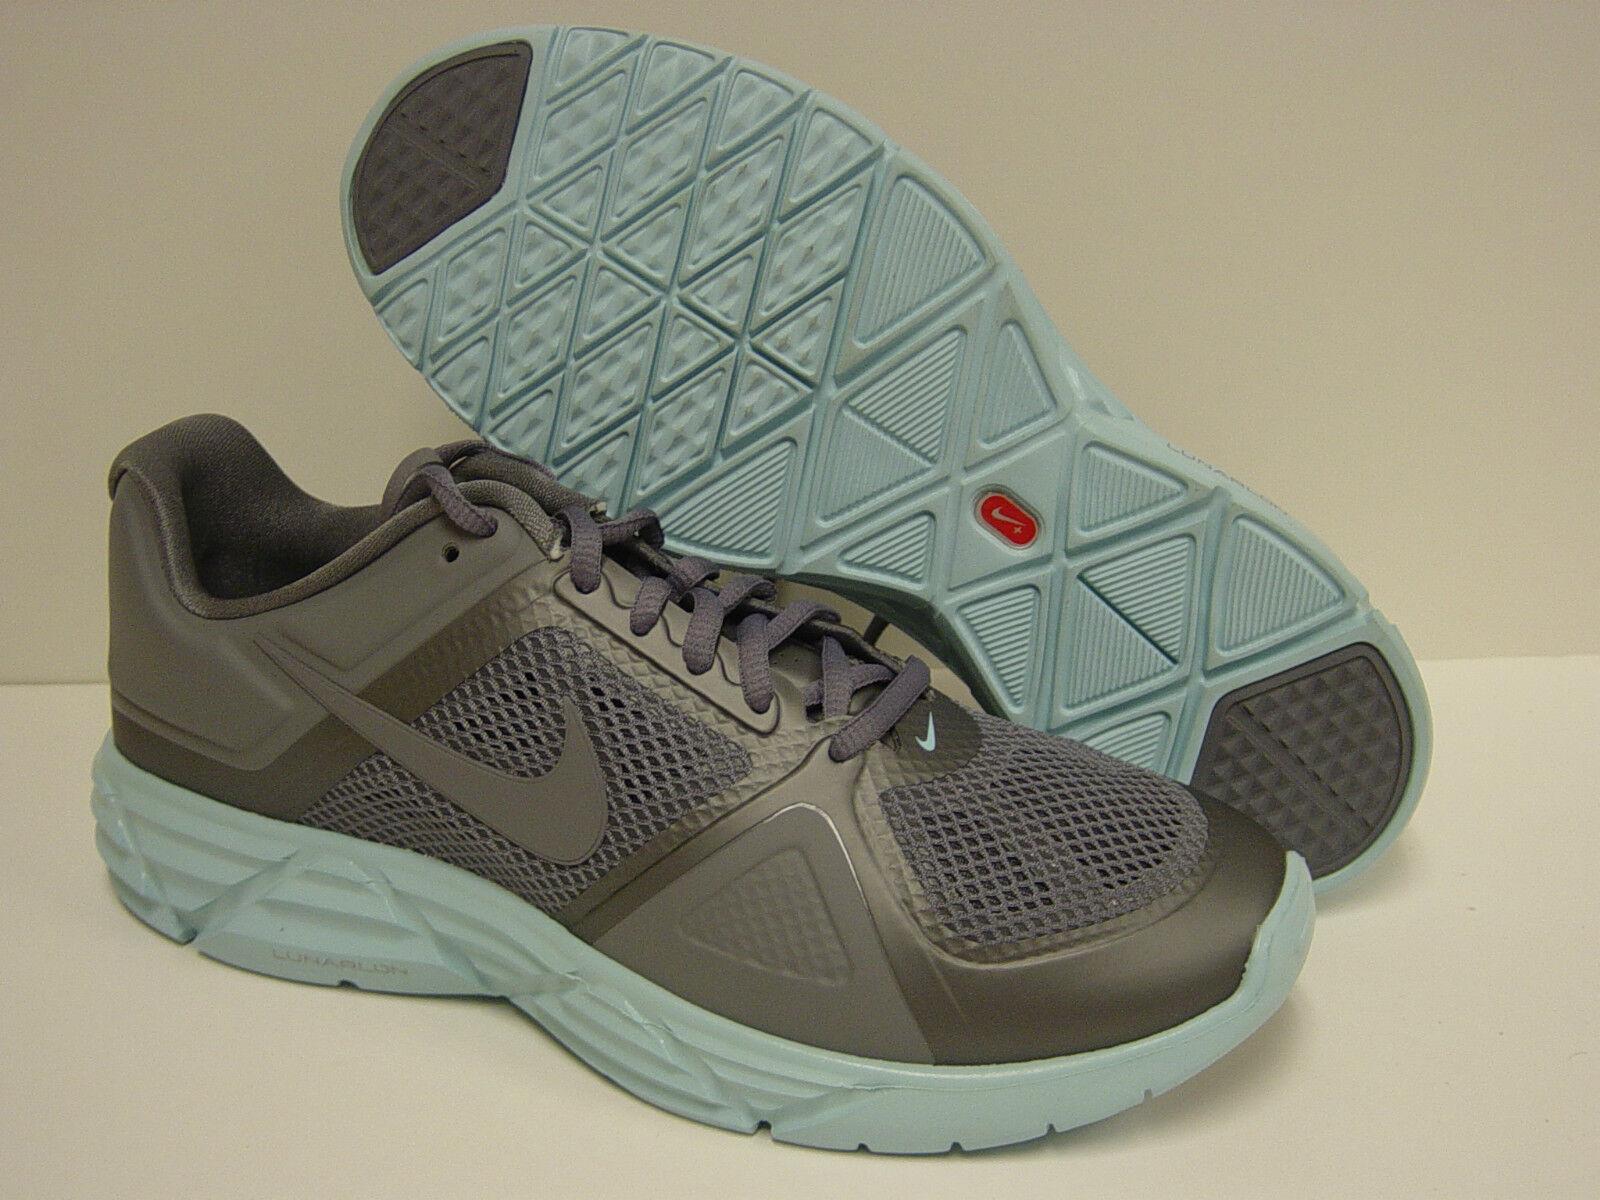 NEW Lunar Womens Sz 9.5 NIKE Lunar NEW Sweet Victory + 429787 001 Grey Sneakers Shoes eee04f